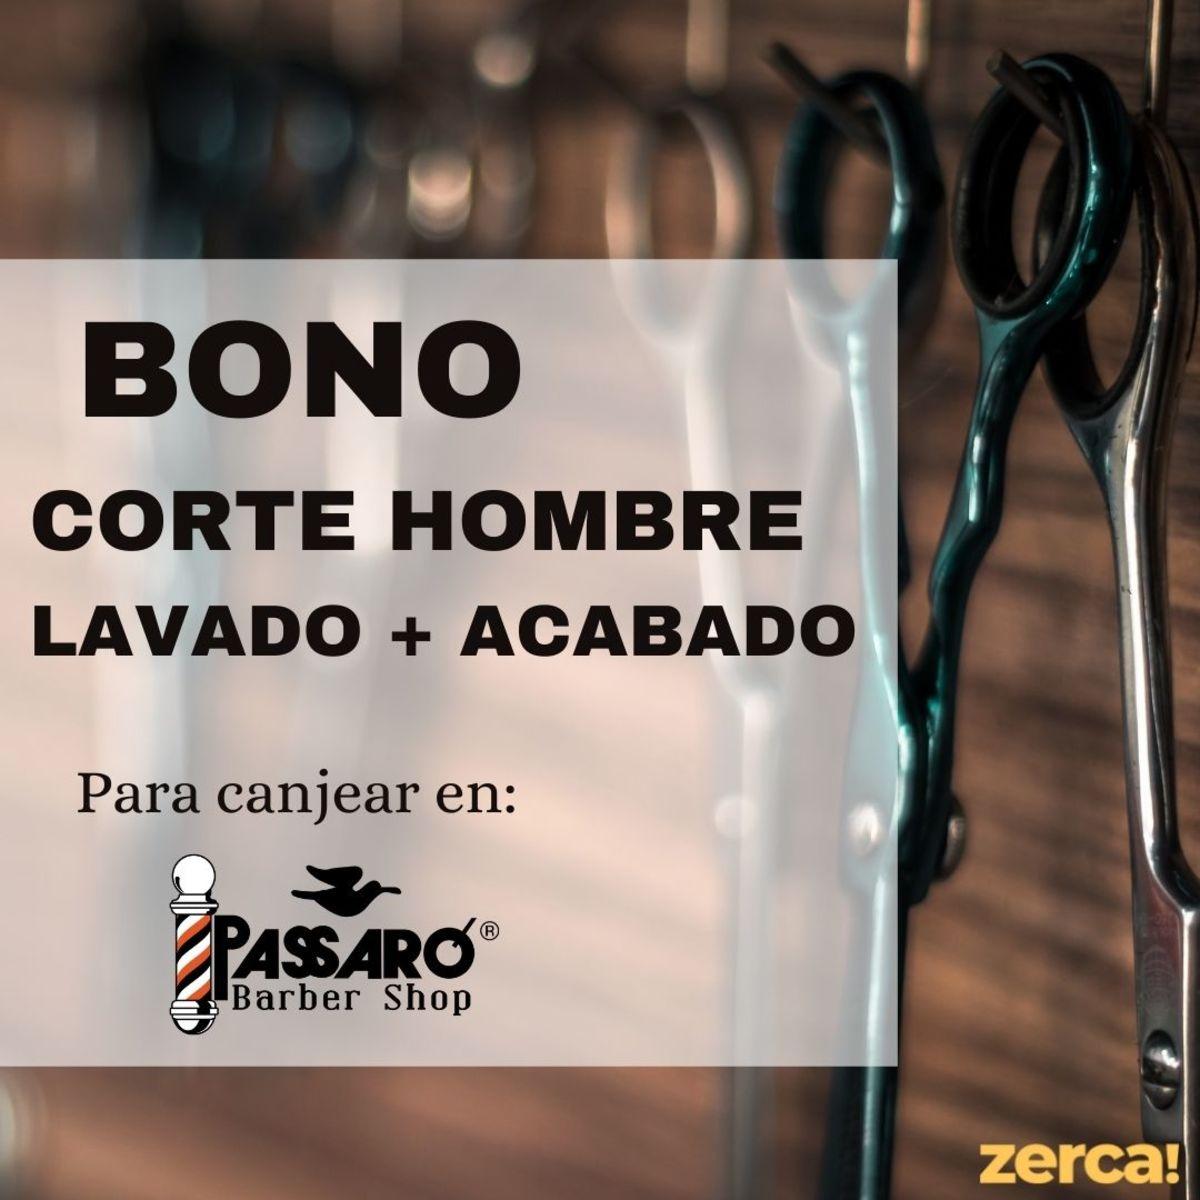 Bono corte hombre PARA CANJEAR EN PASSARÓ PLAZA SAN BRIZ